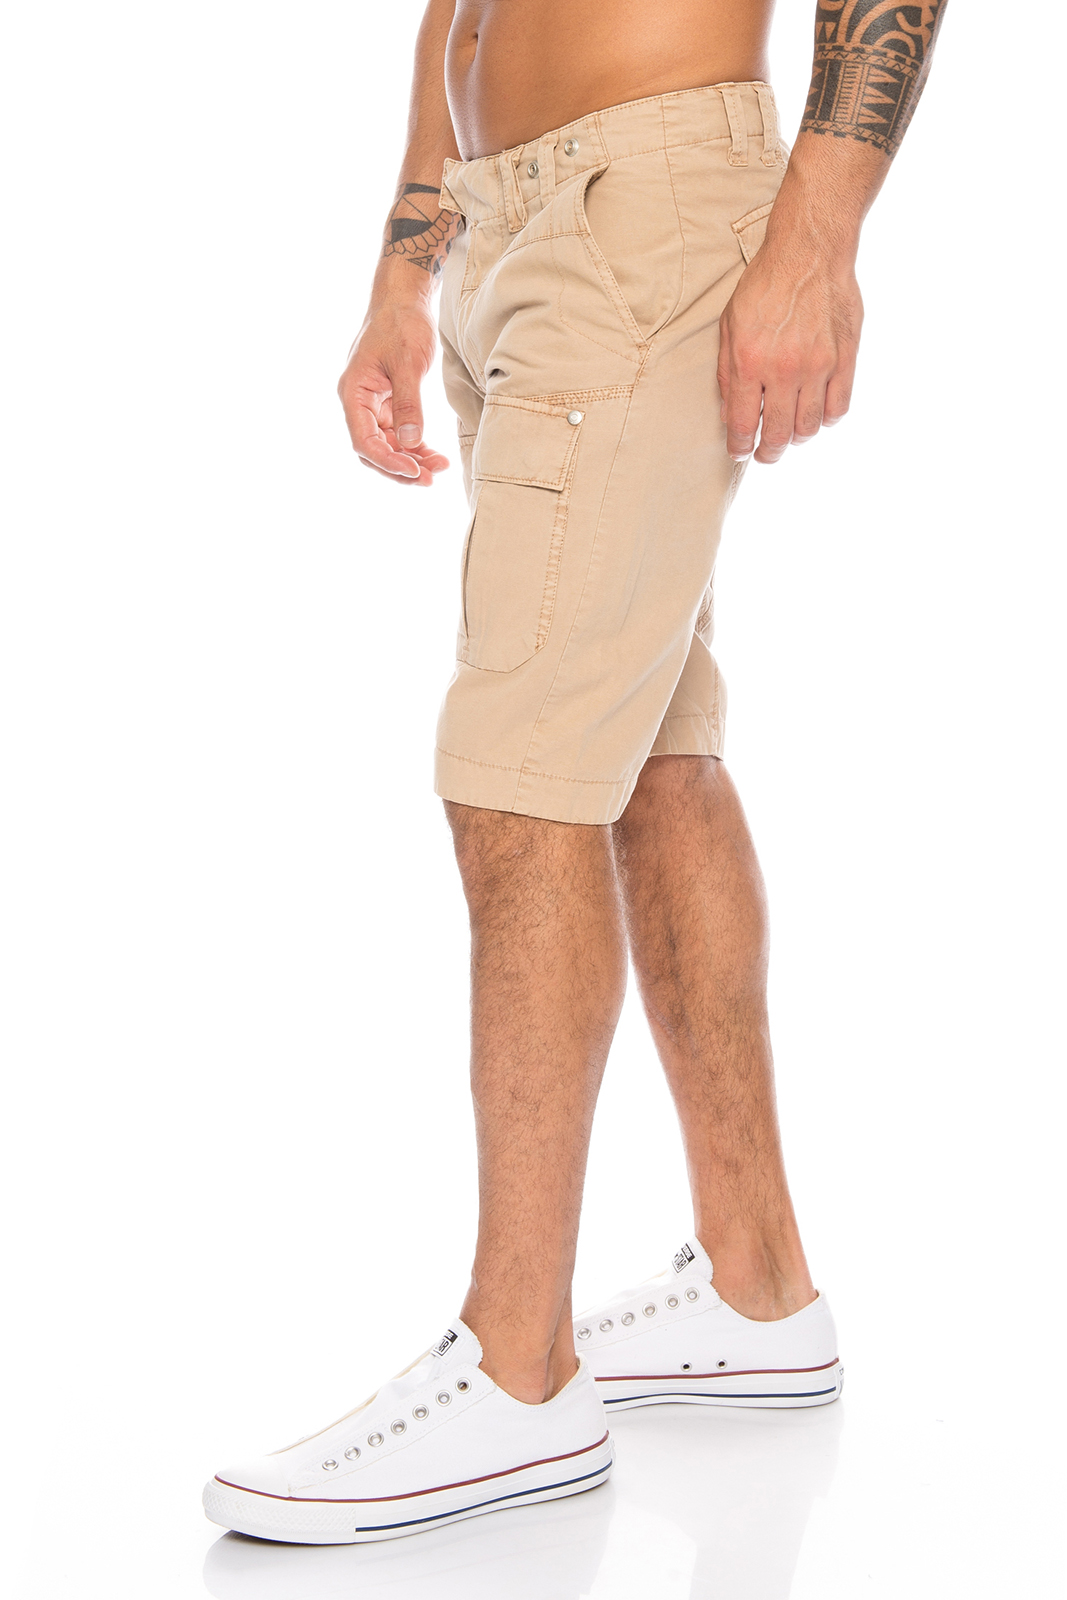 cargoshorts herren bermuda hose shorts cargo capri seitentasche s 3xl h 023 neu ebay. Black Bedroom Furniture Sets. Home Design Ideas